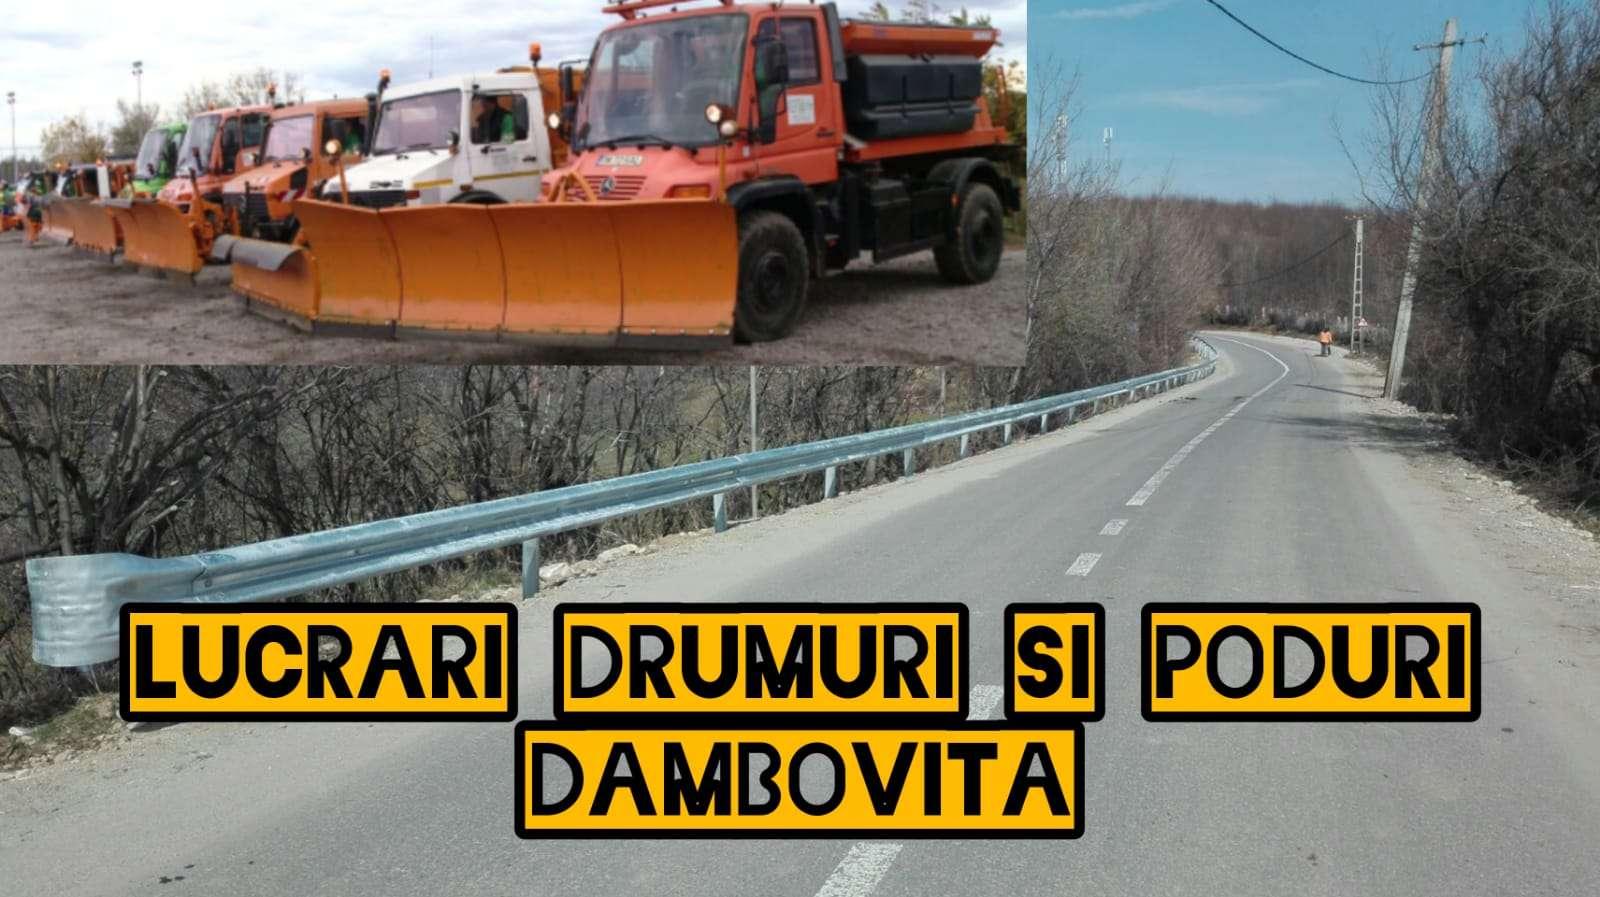 Cauți un JOB? S.C. Lucrări Drumuri și Poduri Dâmbovița S.A. face angajări